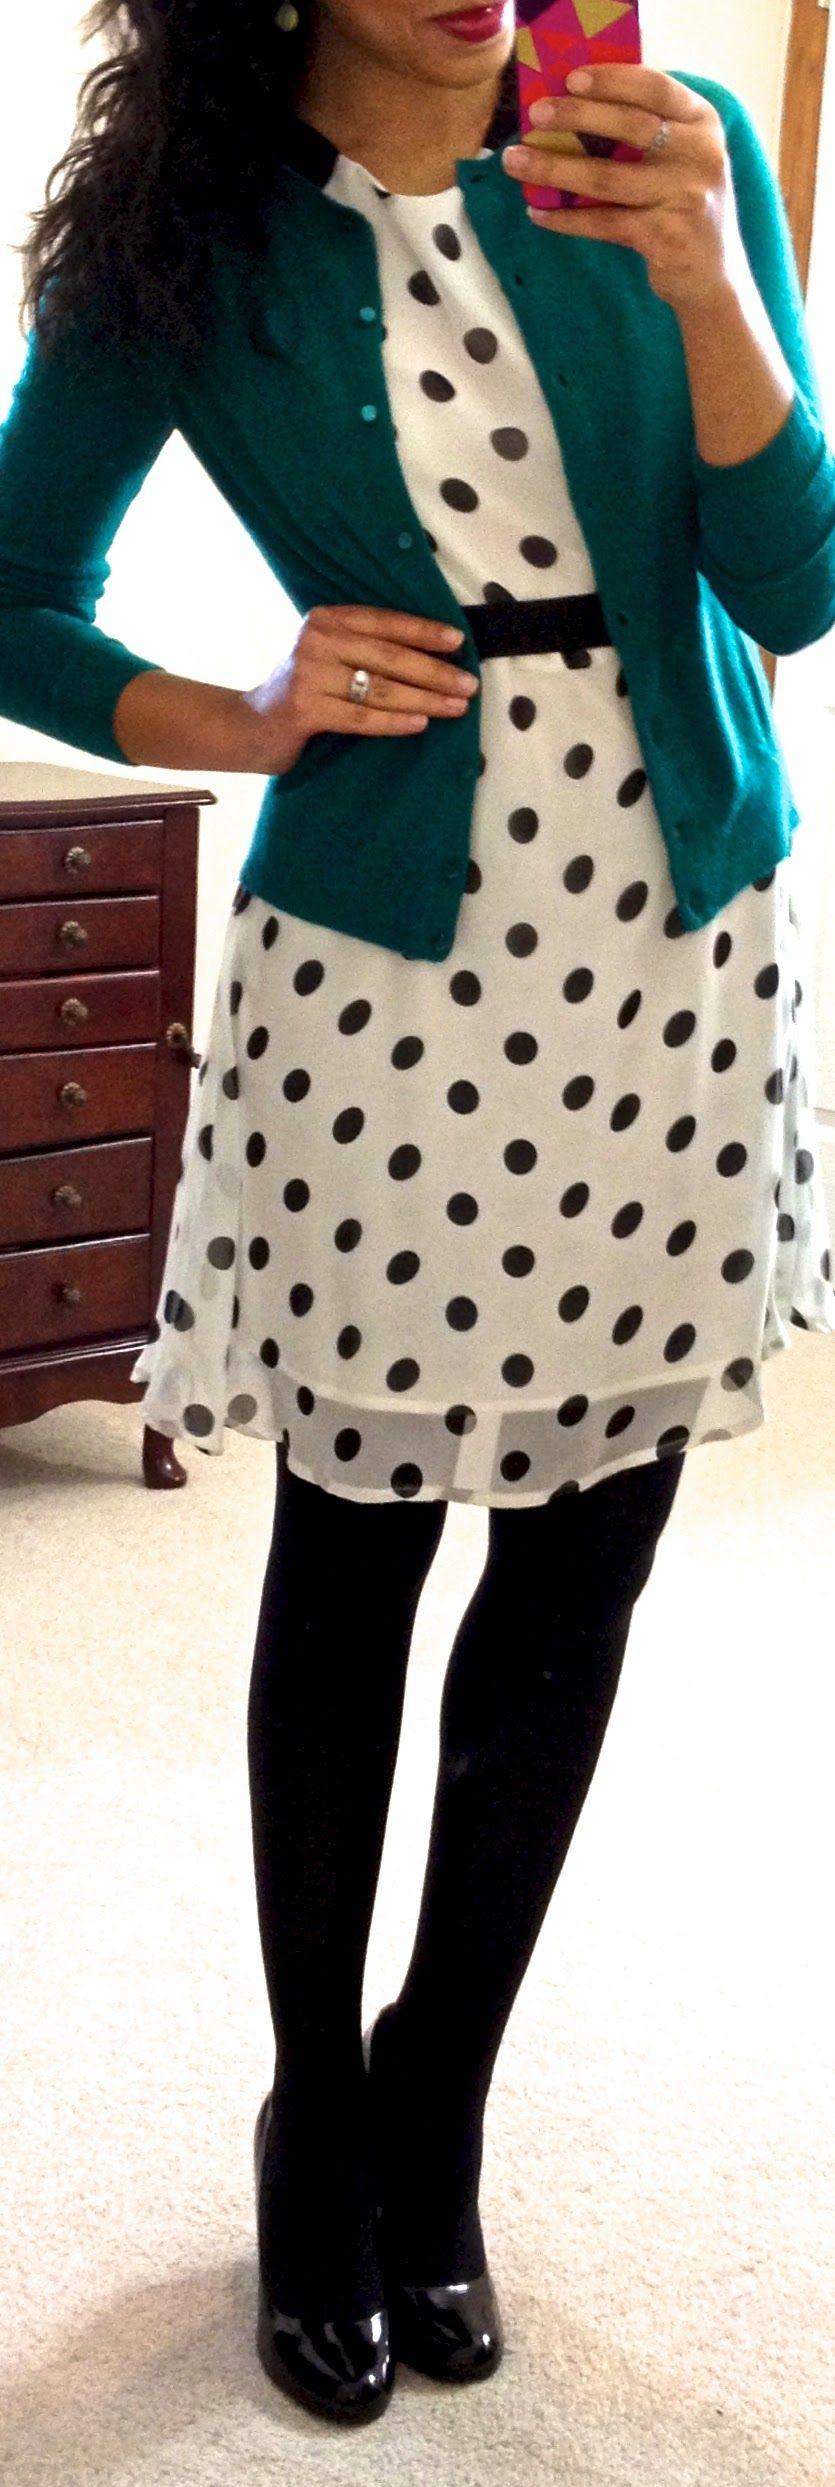 polka dot dress, cardigan, black tights, black shoes ...